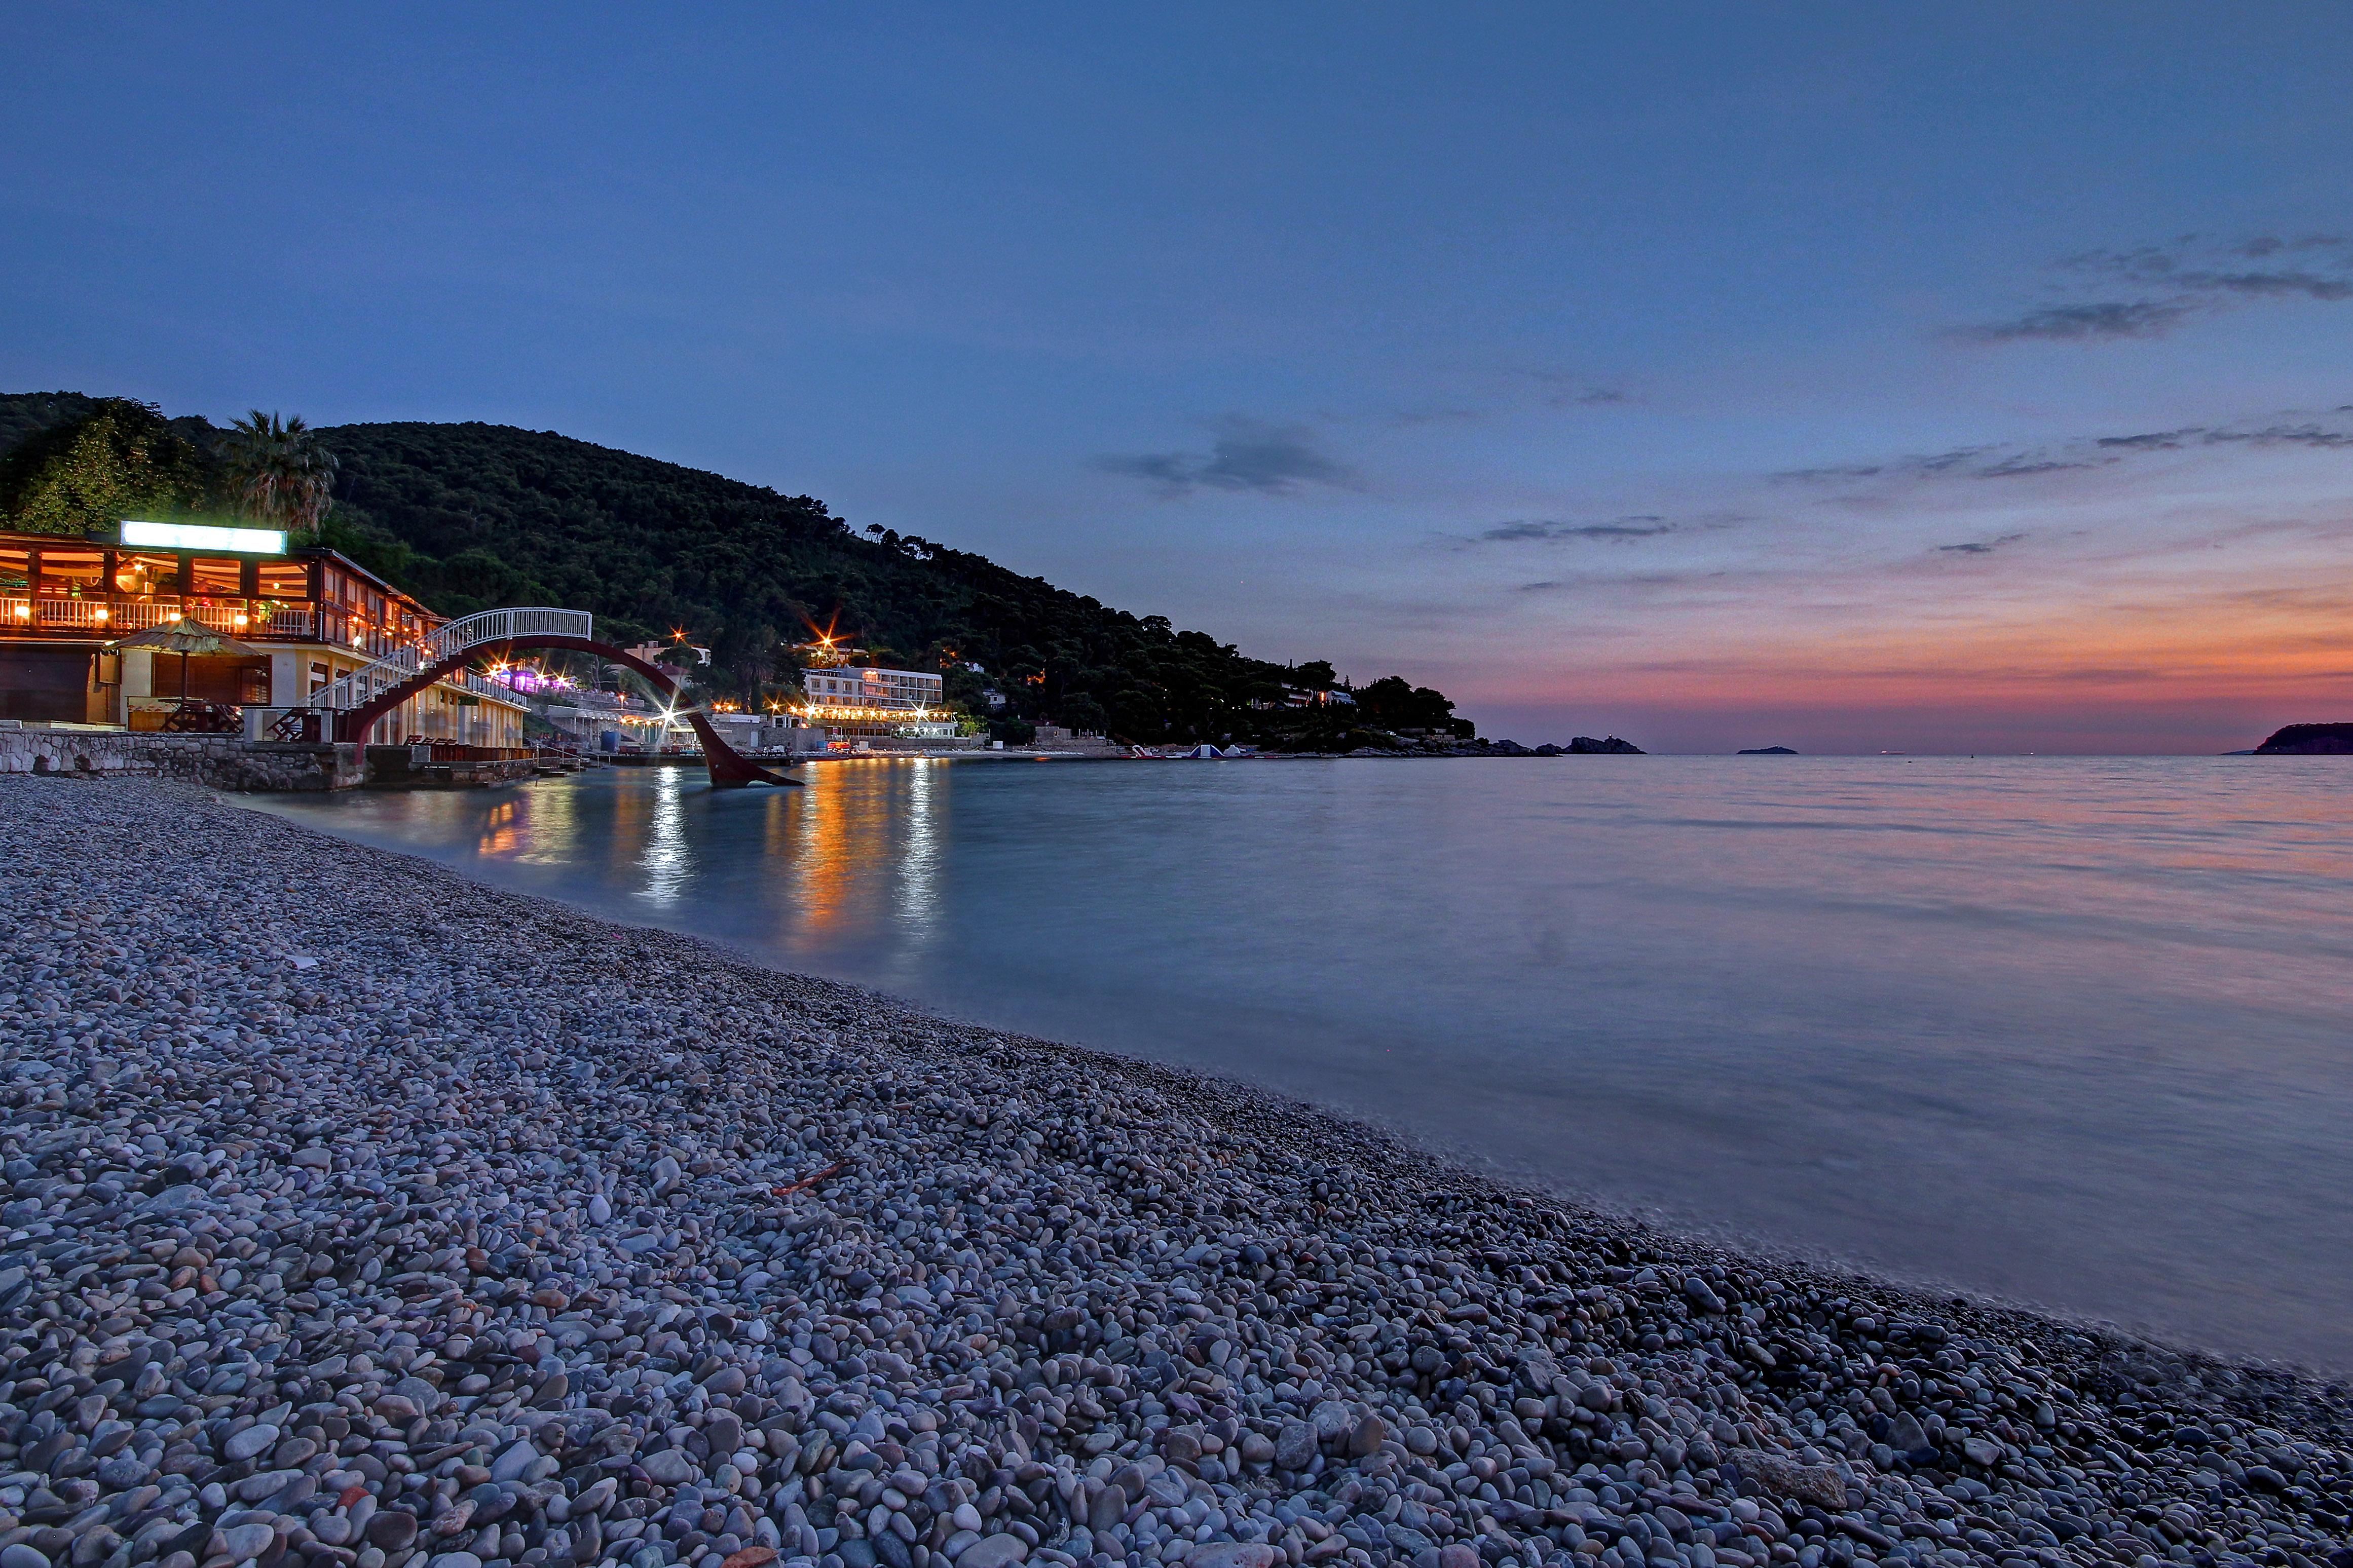 hotels-beach-night-lapadbay